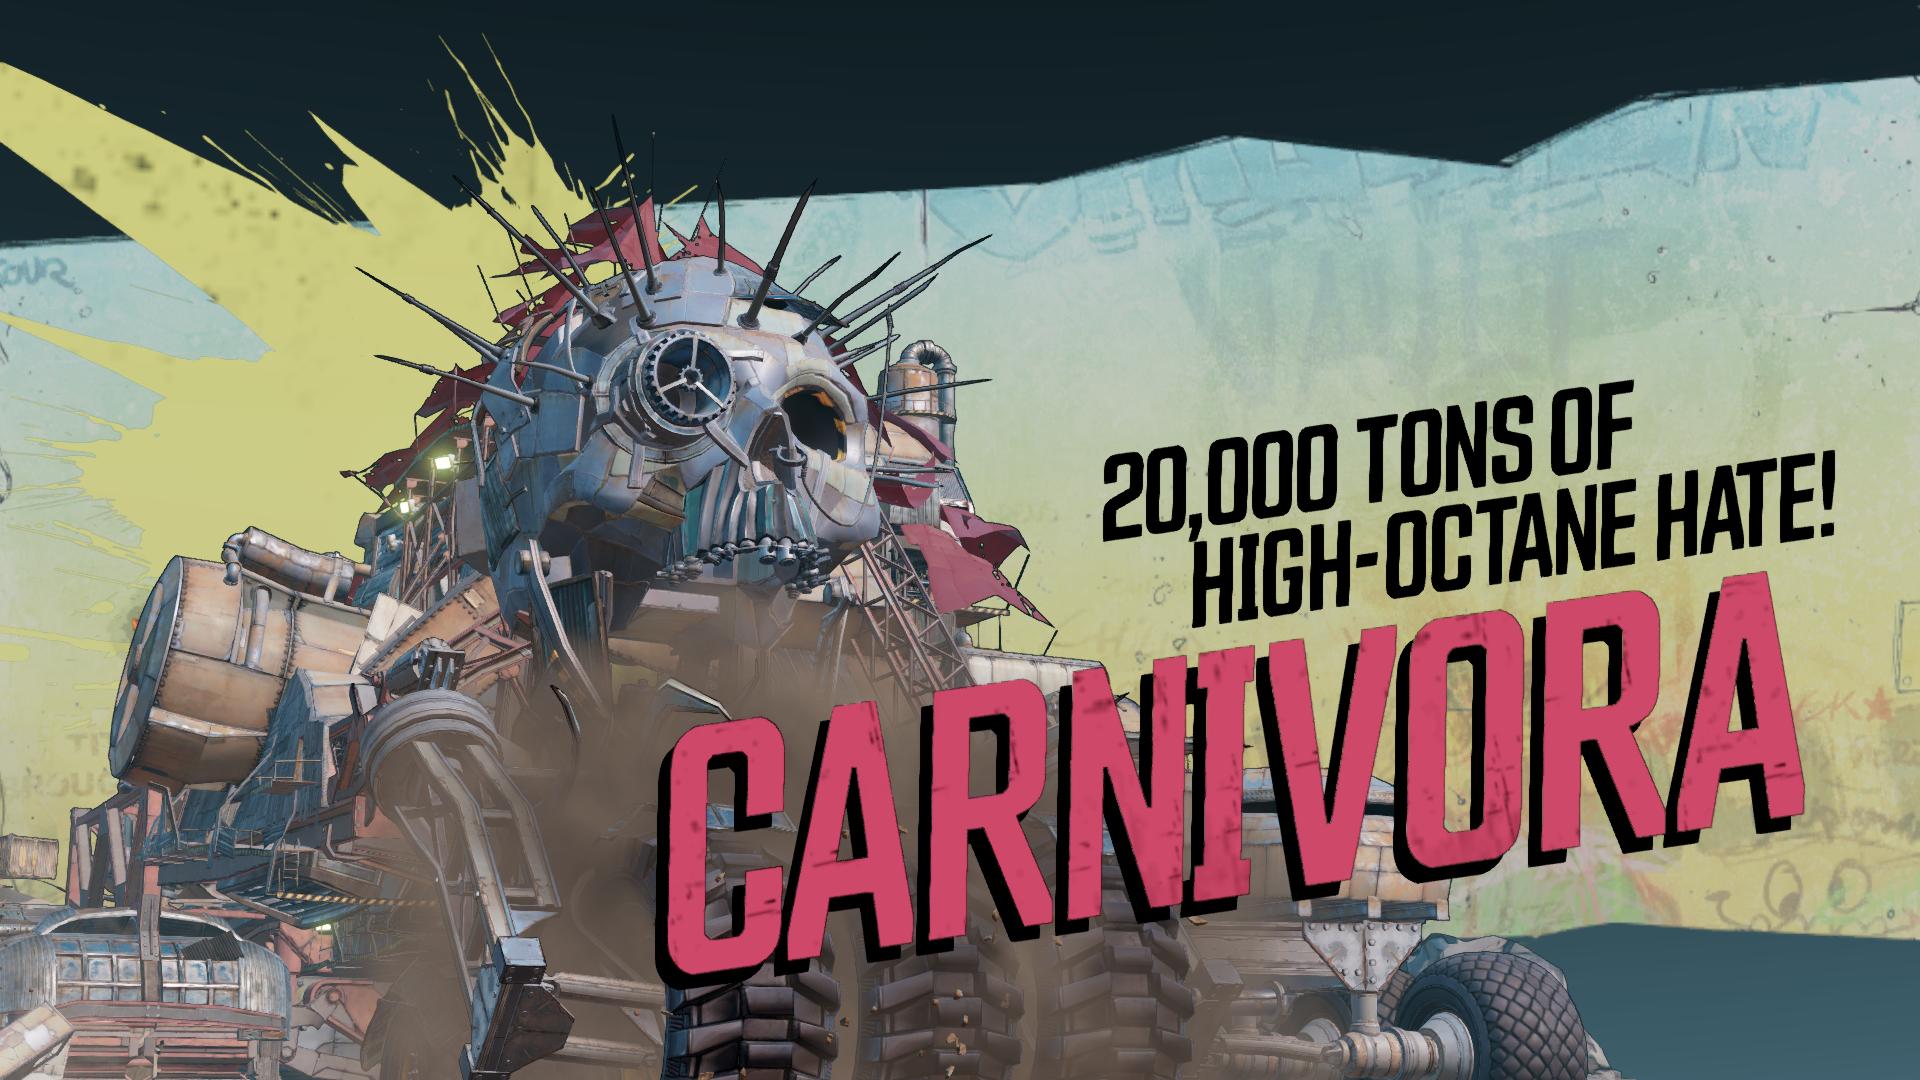 Carnivora (vehicle)